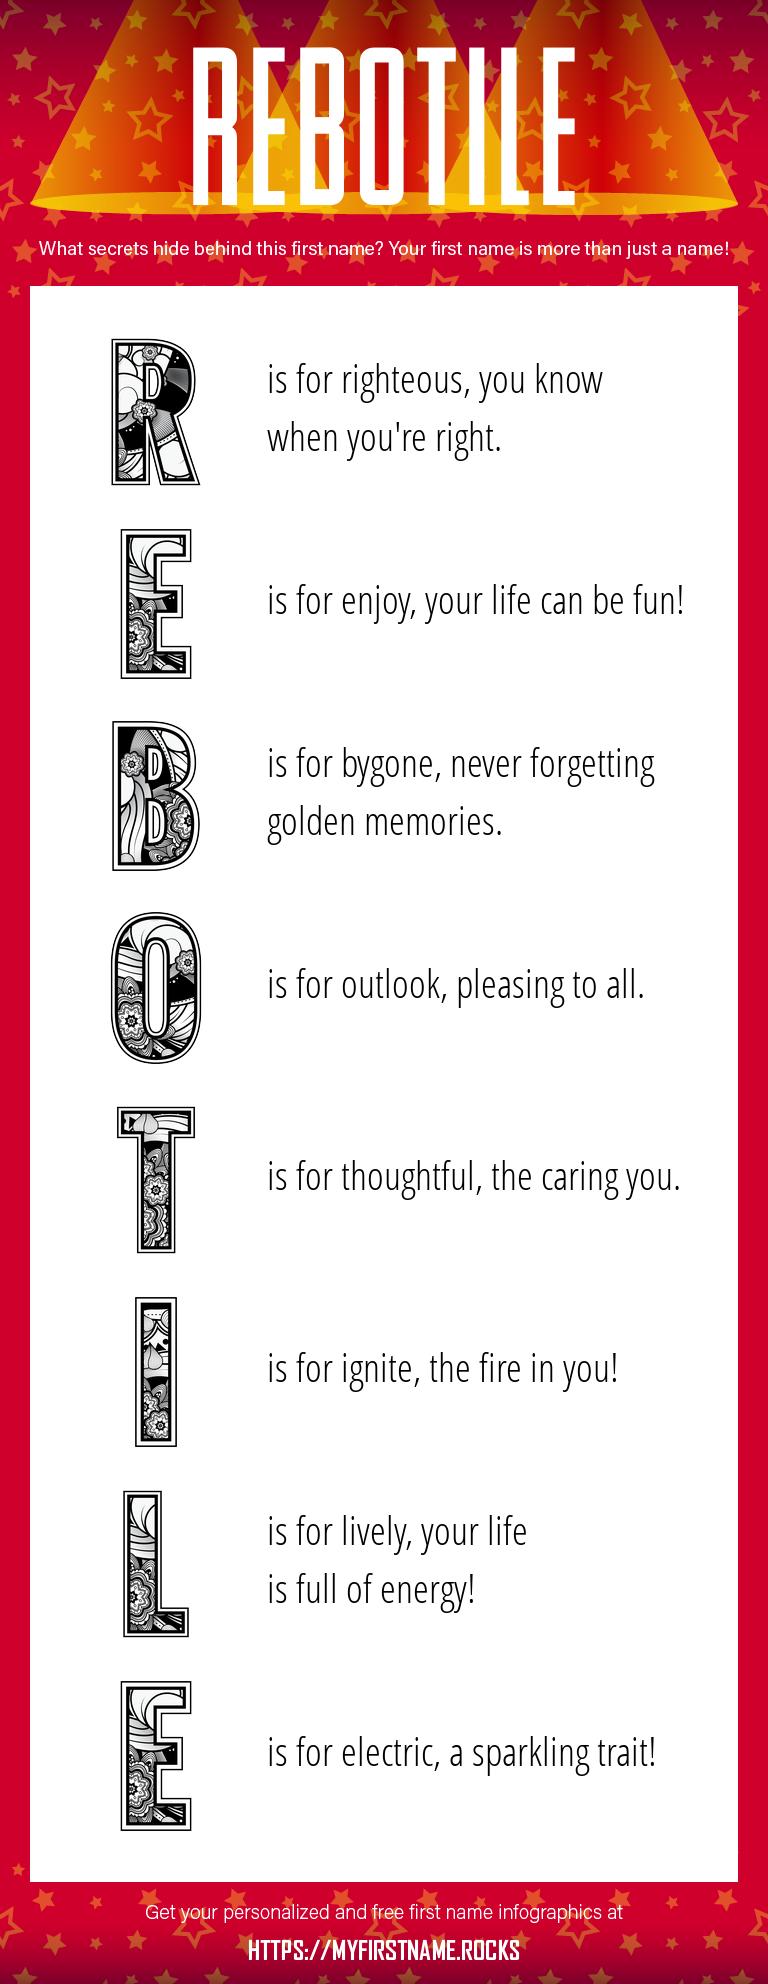 Rebotile Infographics